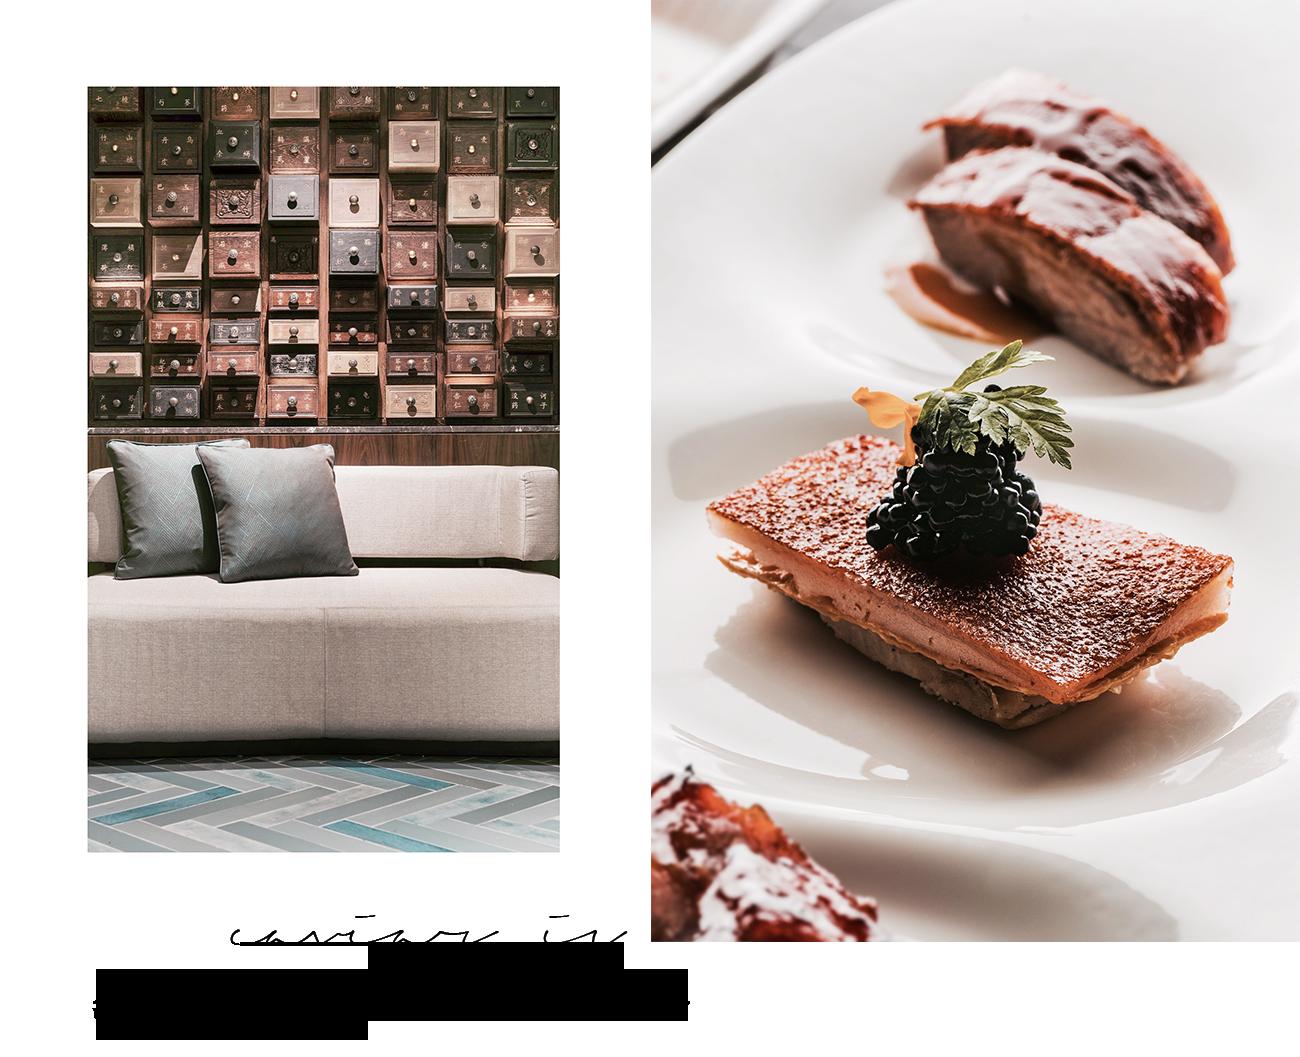 willabelle-ong-paledivision-street-style-fashion-travel-lifestyle-blog-four-seasons-hotel-singapore-editorial-retreat-luxury-peking-duck-caviar